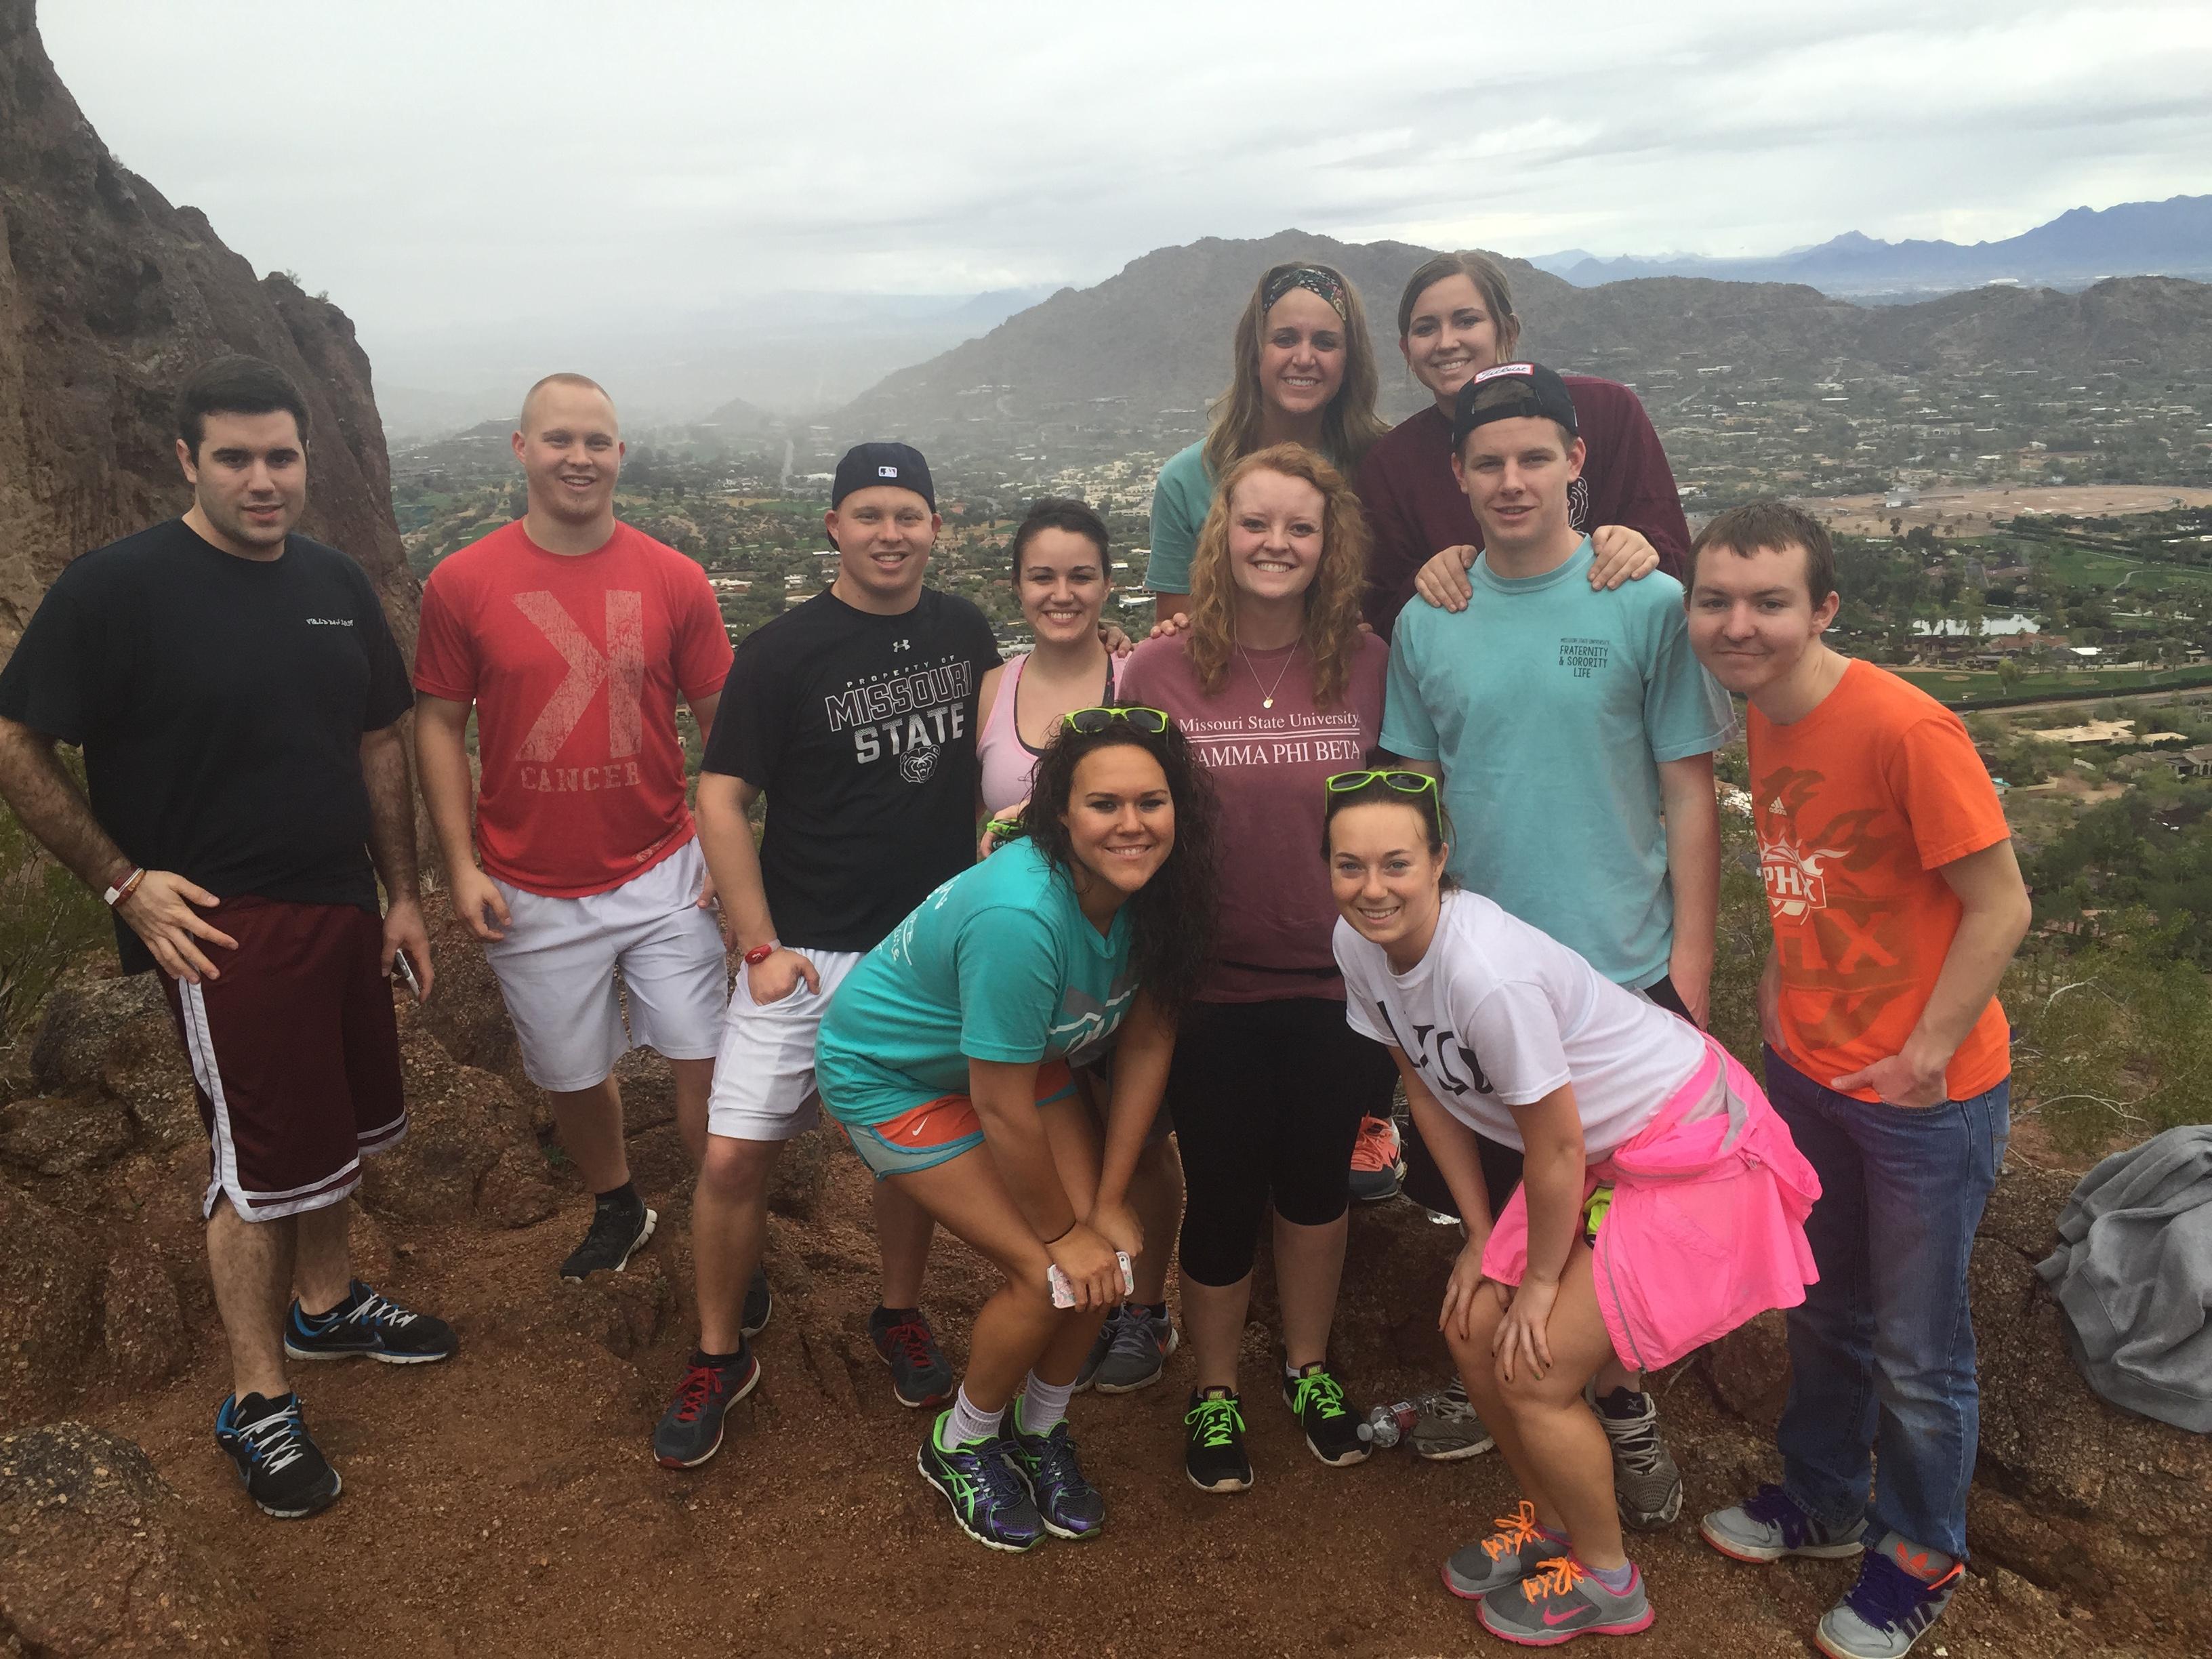 15 EMA students volunteer at 2015 Super Bowl!